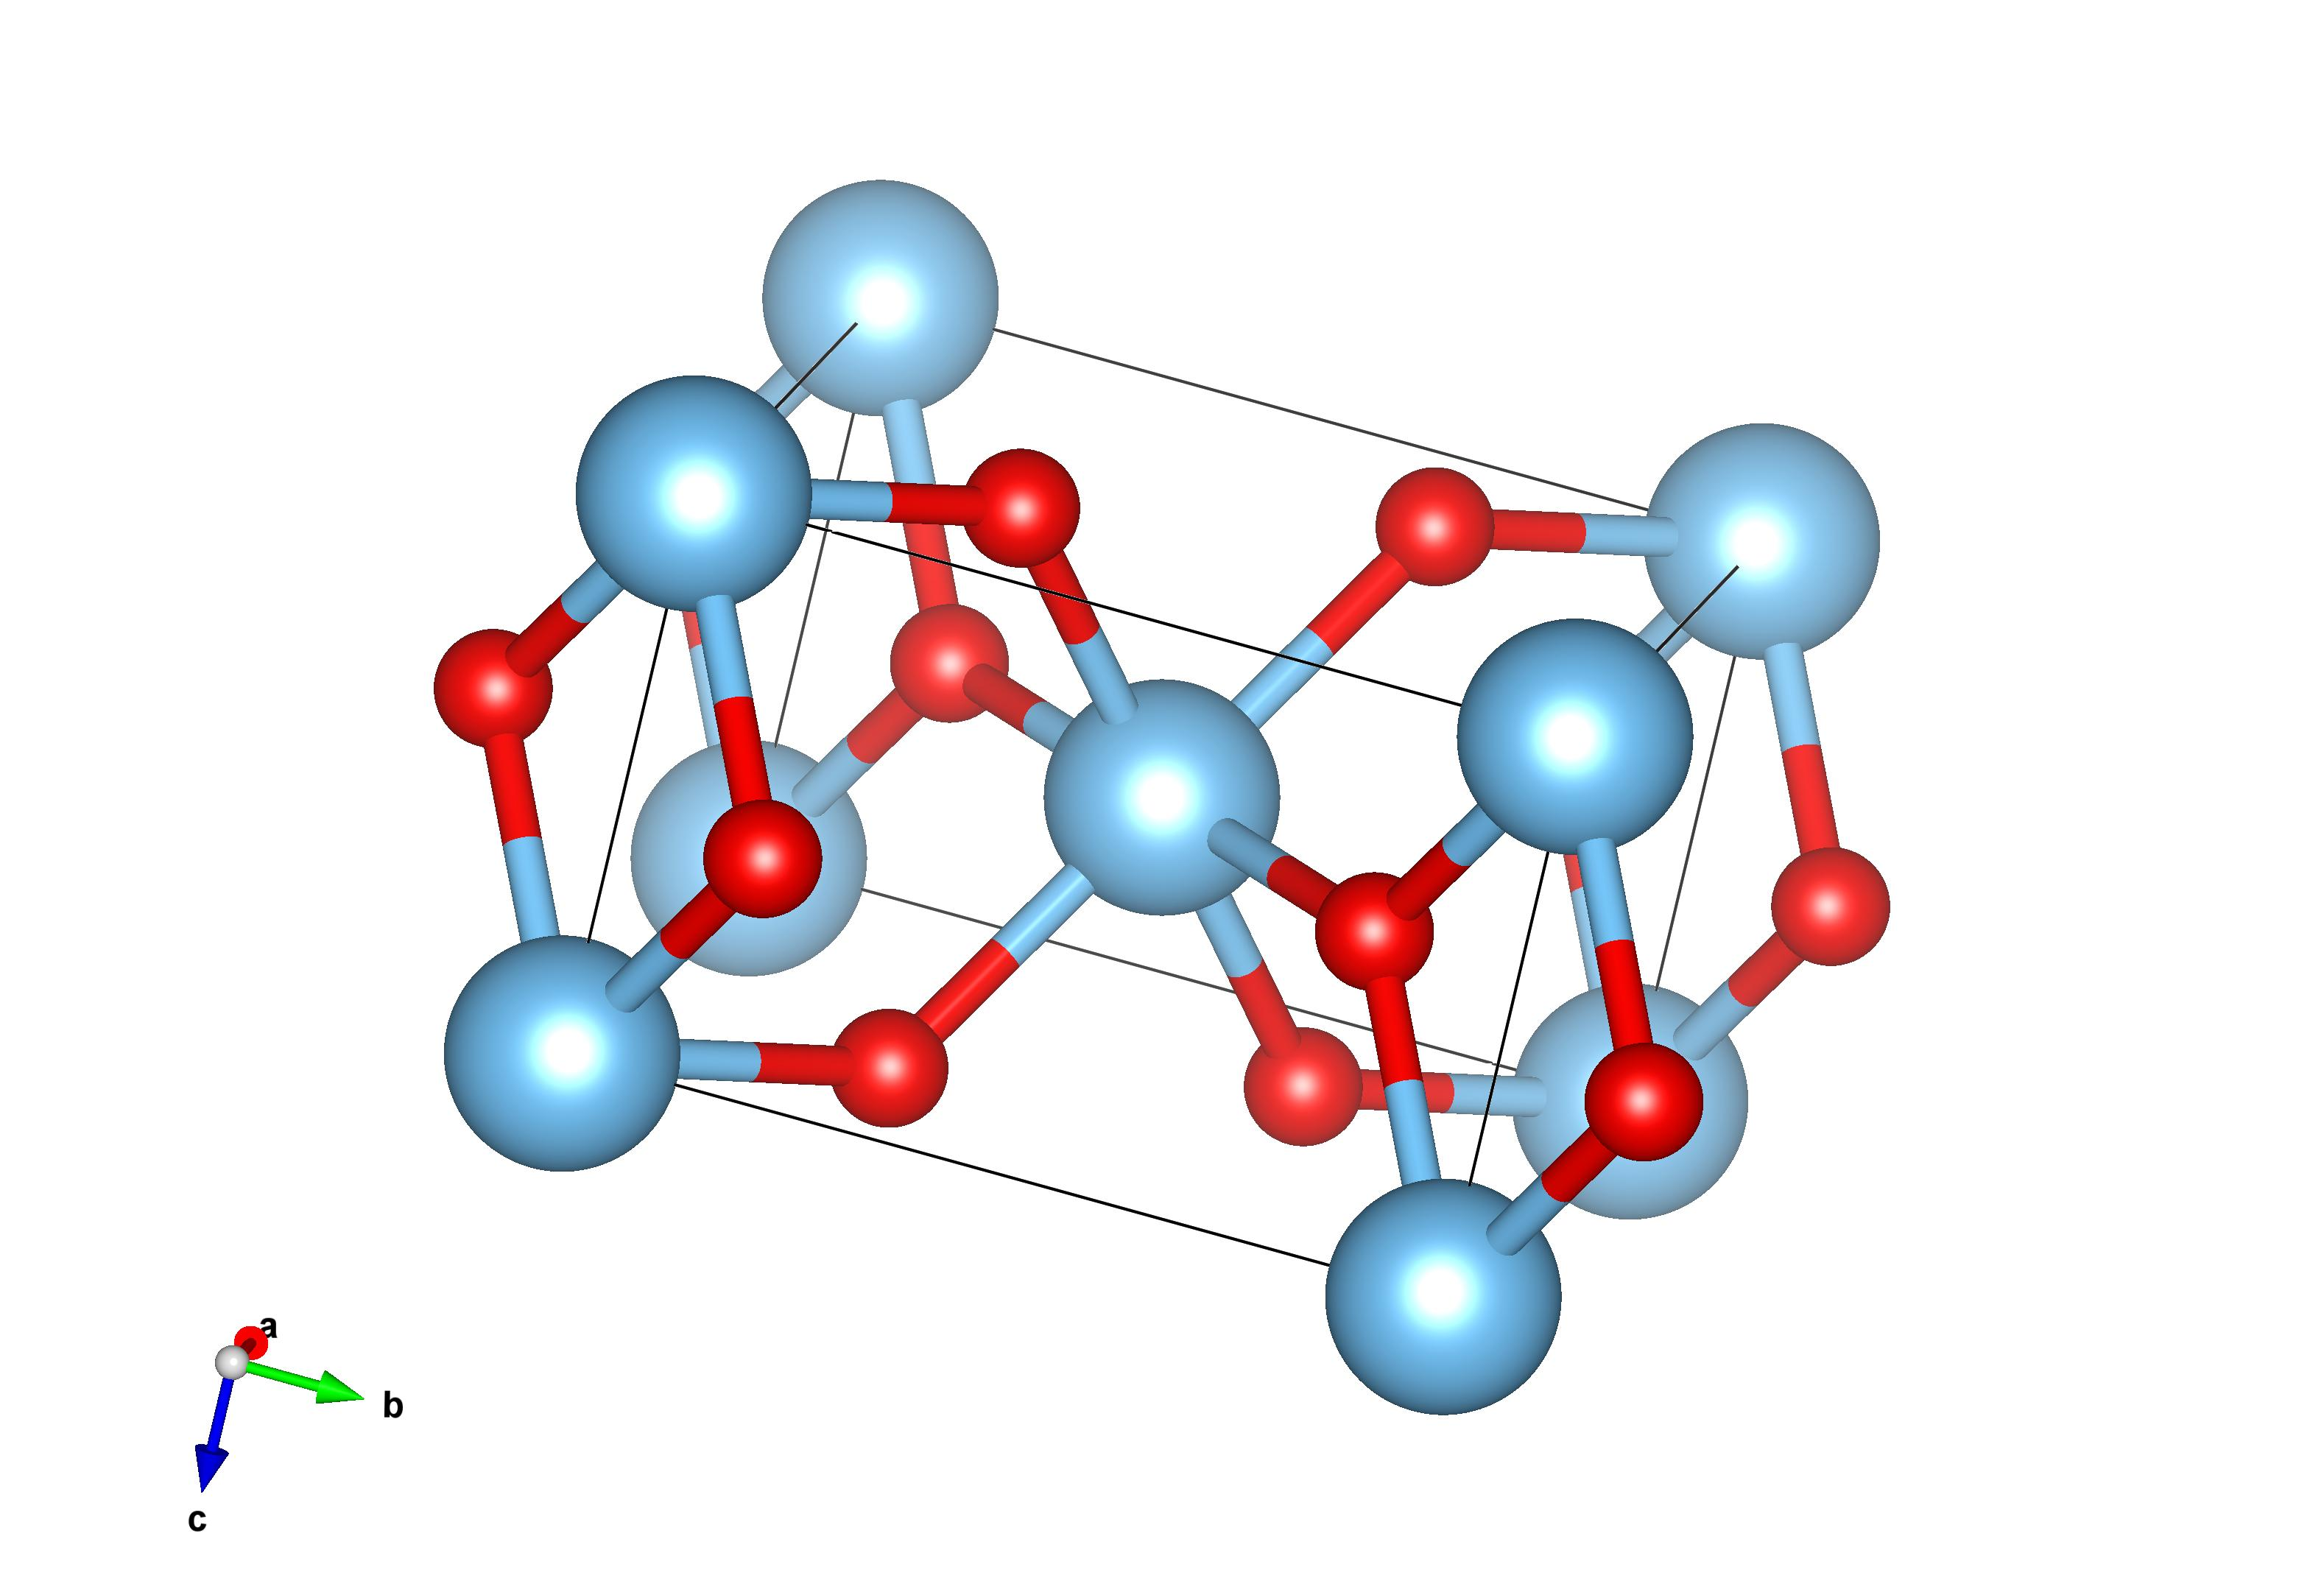 copper atom diagram crochet border pigment crystallography365